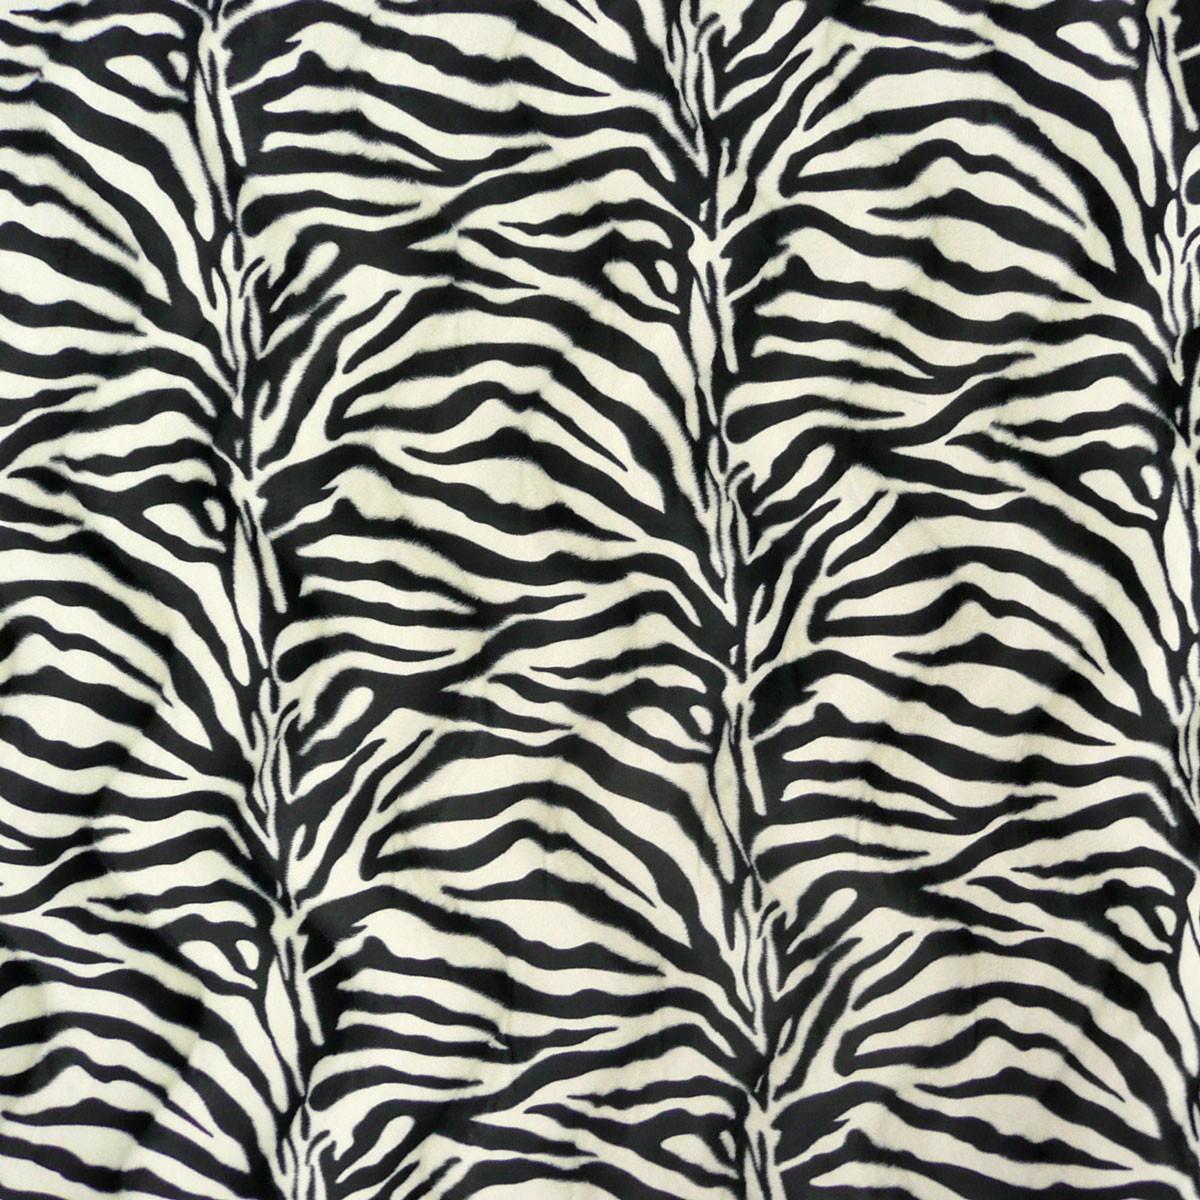 pl sch velour fellstoff fellimitat kunstfell stoff zebra meterware baunach. Black Bedroom Furniture Sets. Home Design Ideas